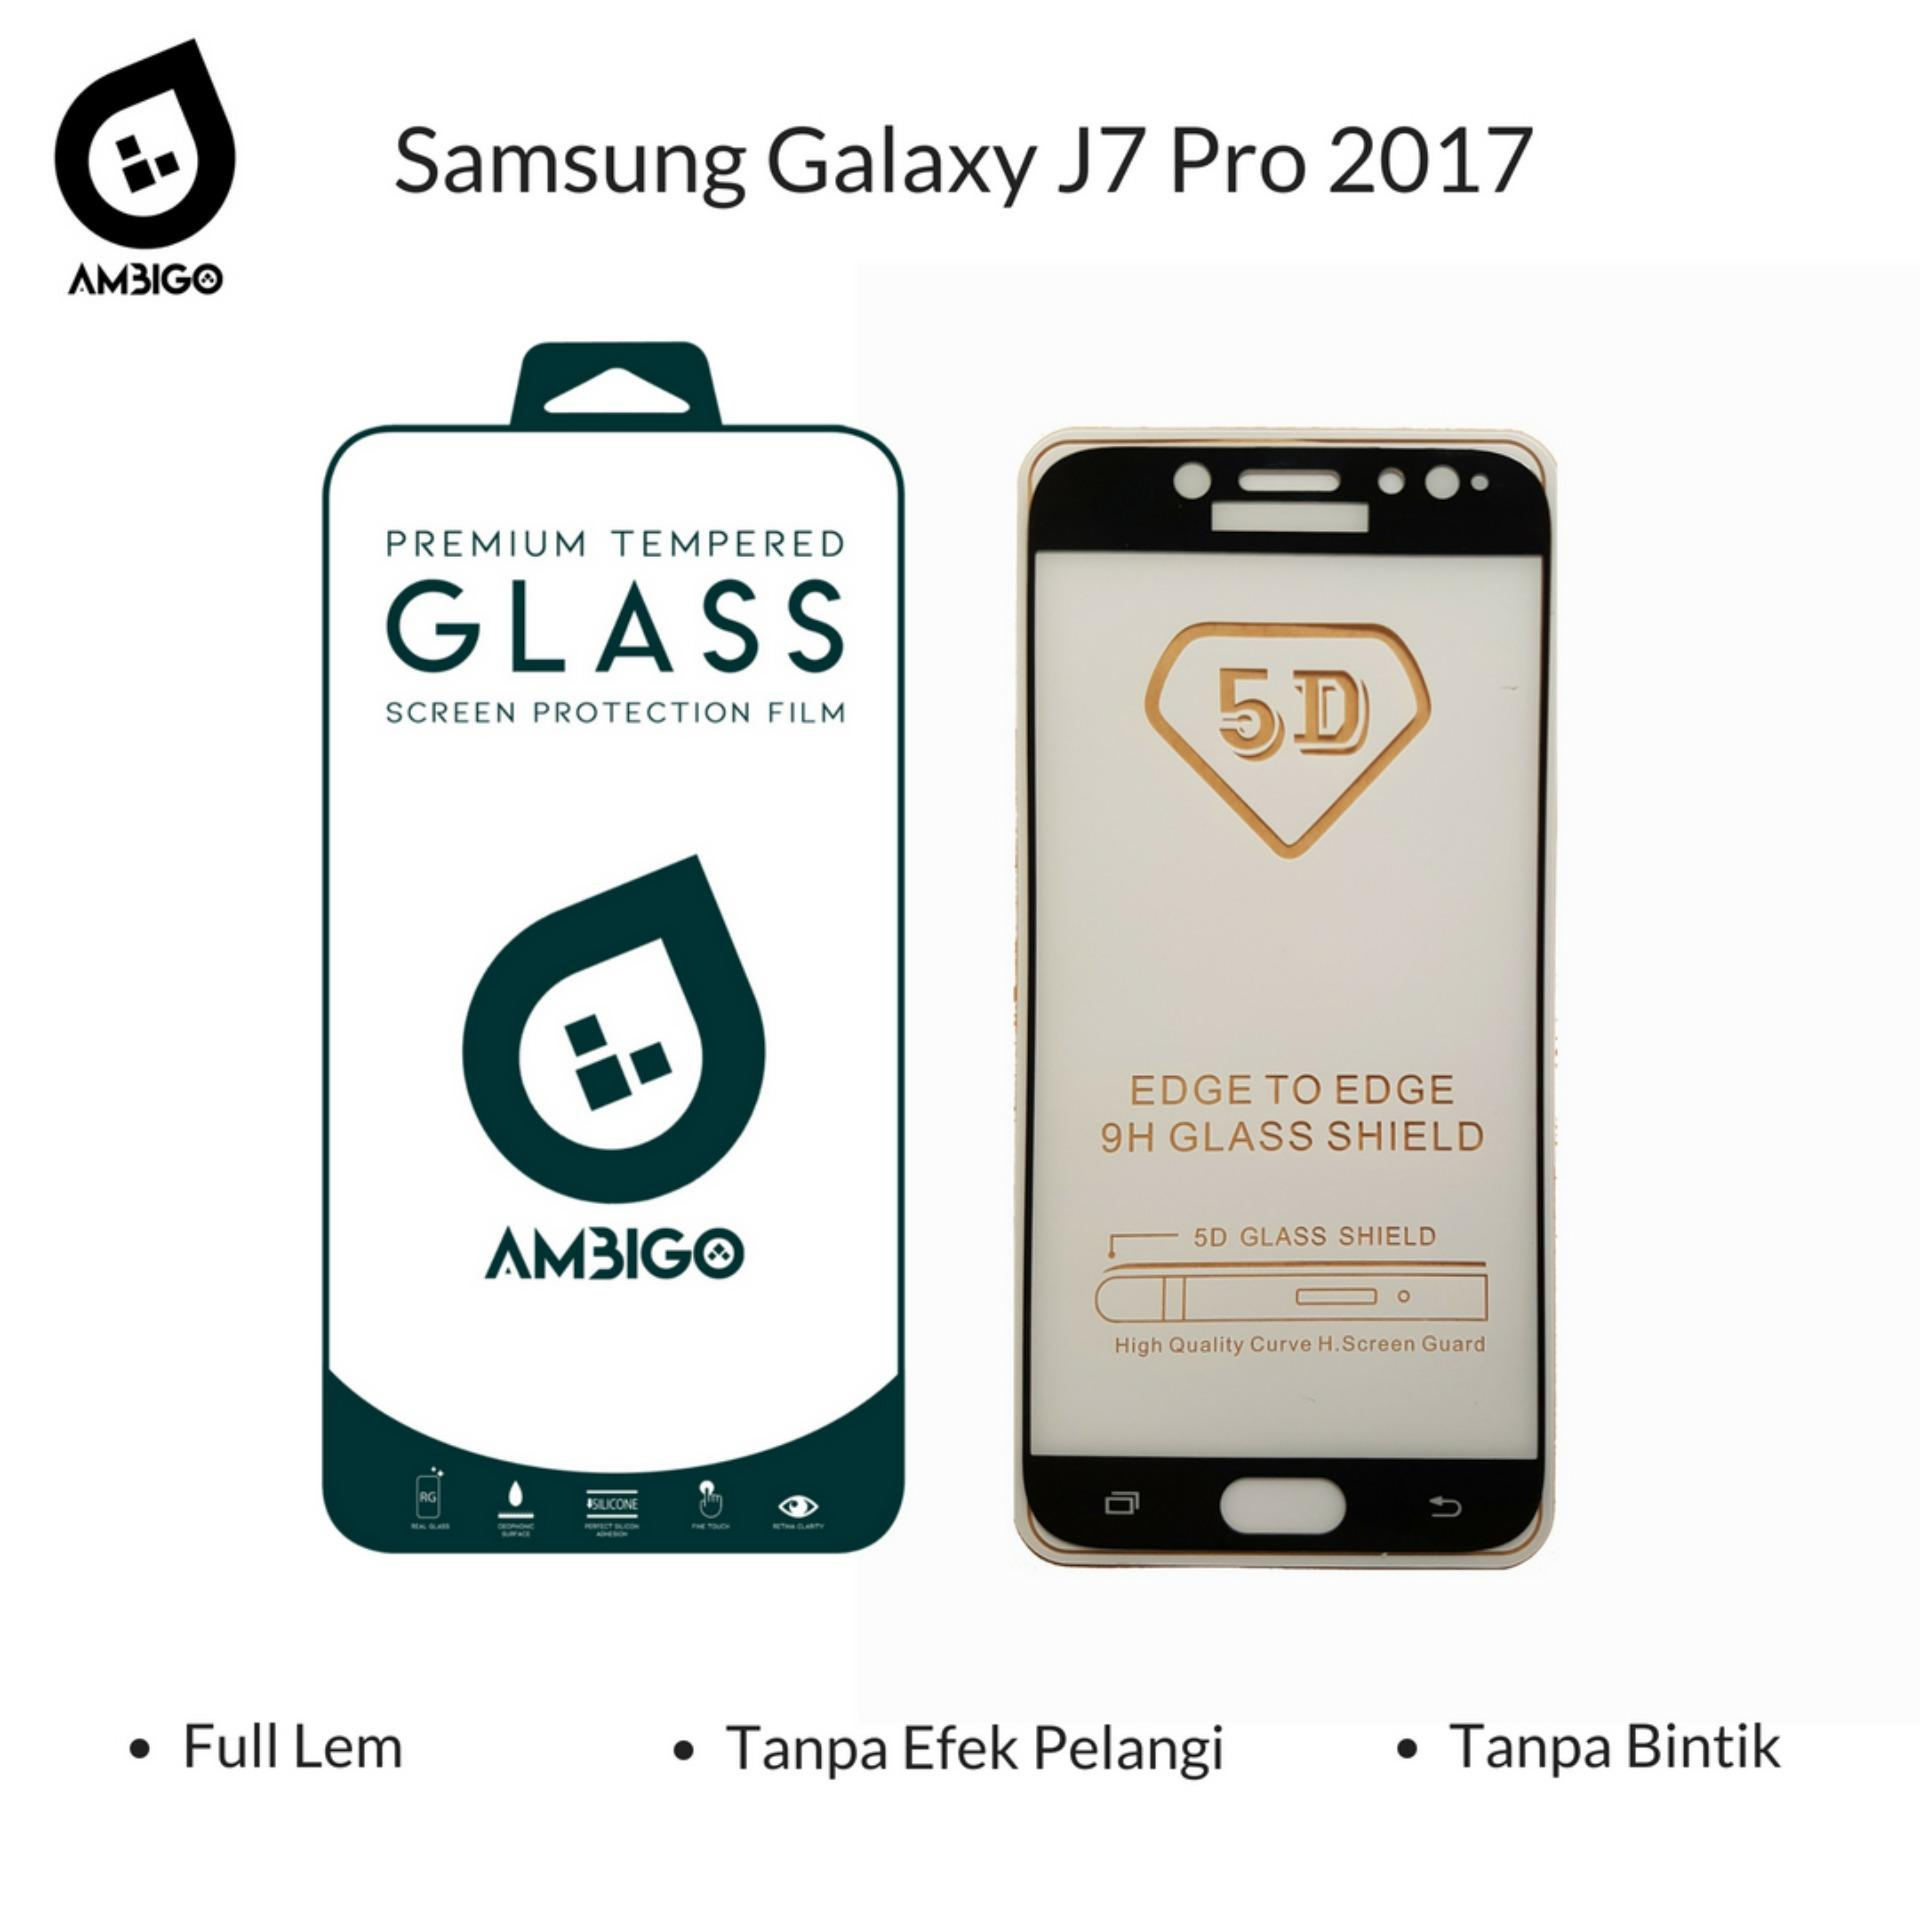 Accessories Hp Ambigo Tempered Glass 5D Full Cover Warna / Anti Gores Kaca Full Lem Untuk Samsung Galaxy J7 Pro 2017 ( J730 ) - Black